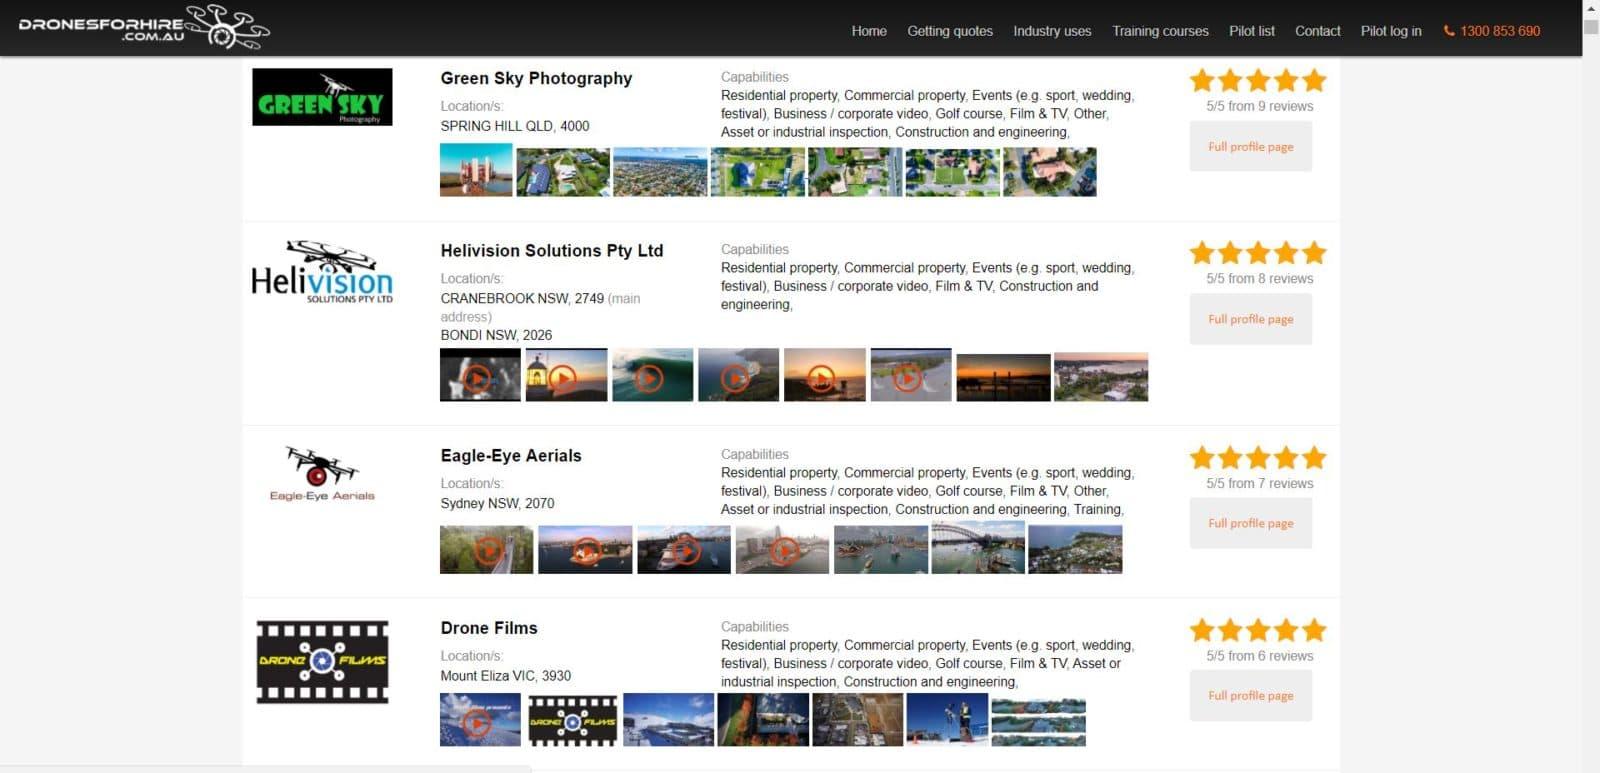 Brisbane Drone Phtography